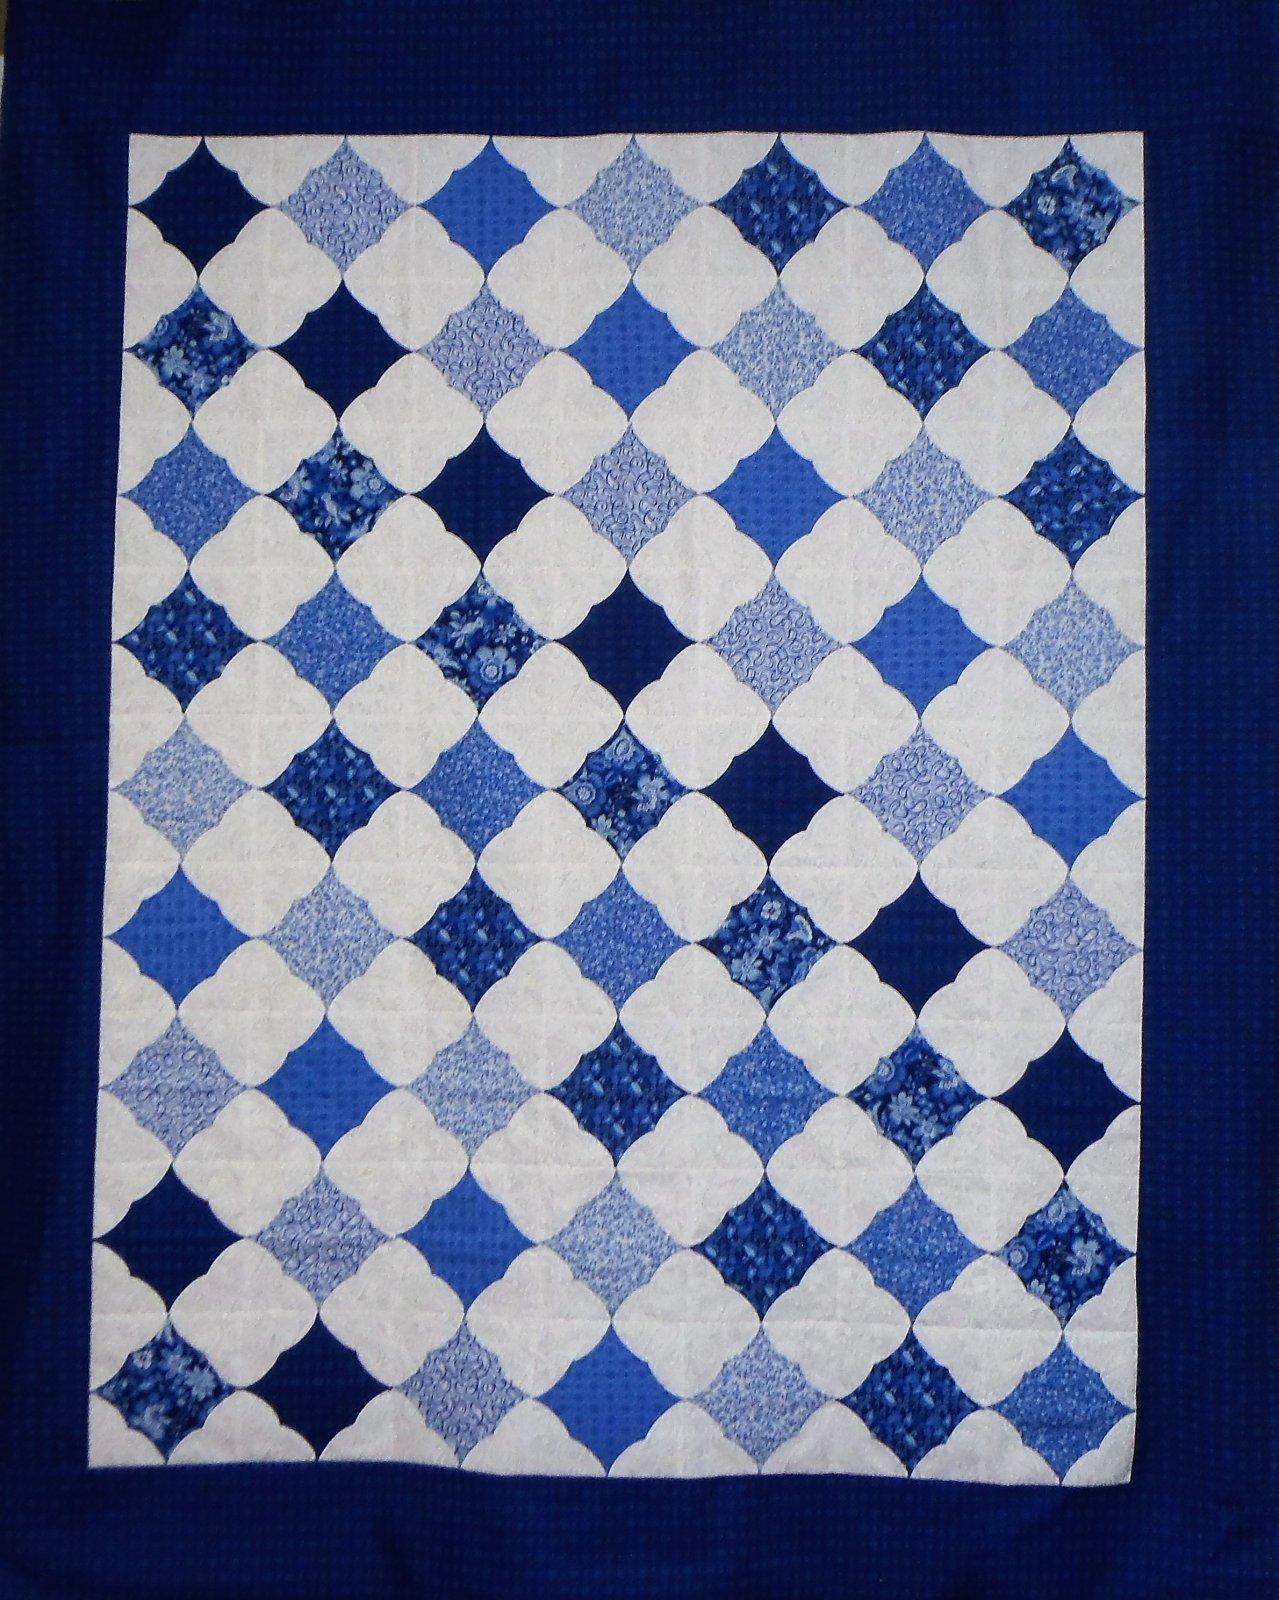 Snow Puzzle Quilt Top